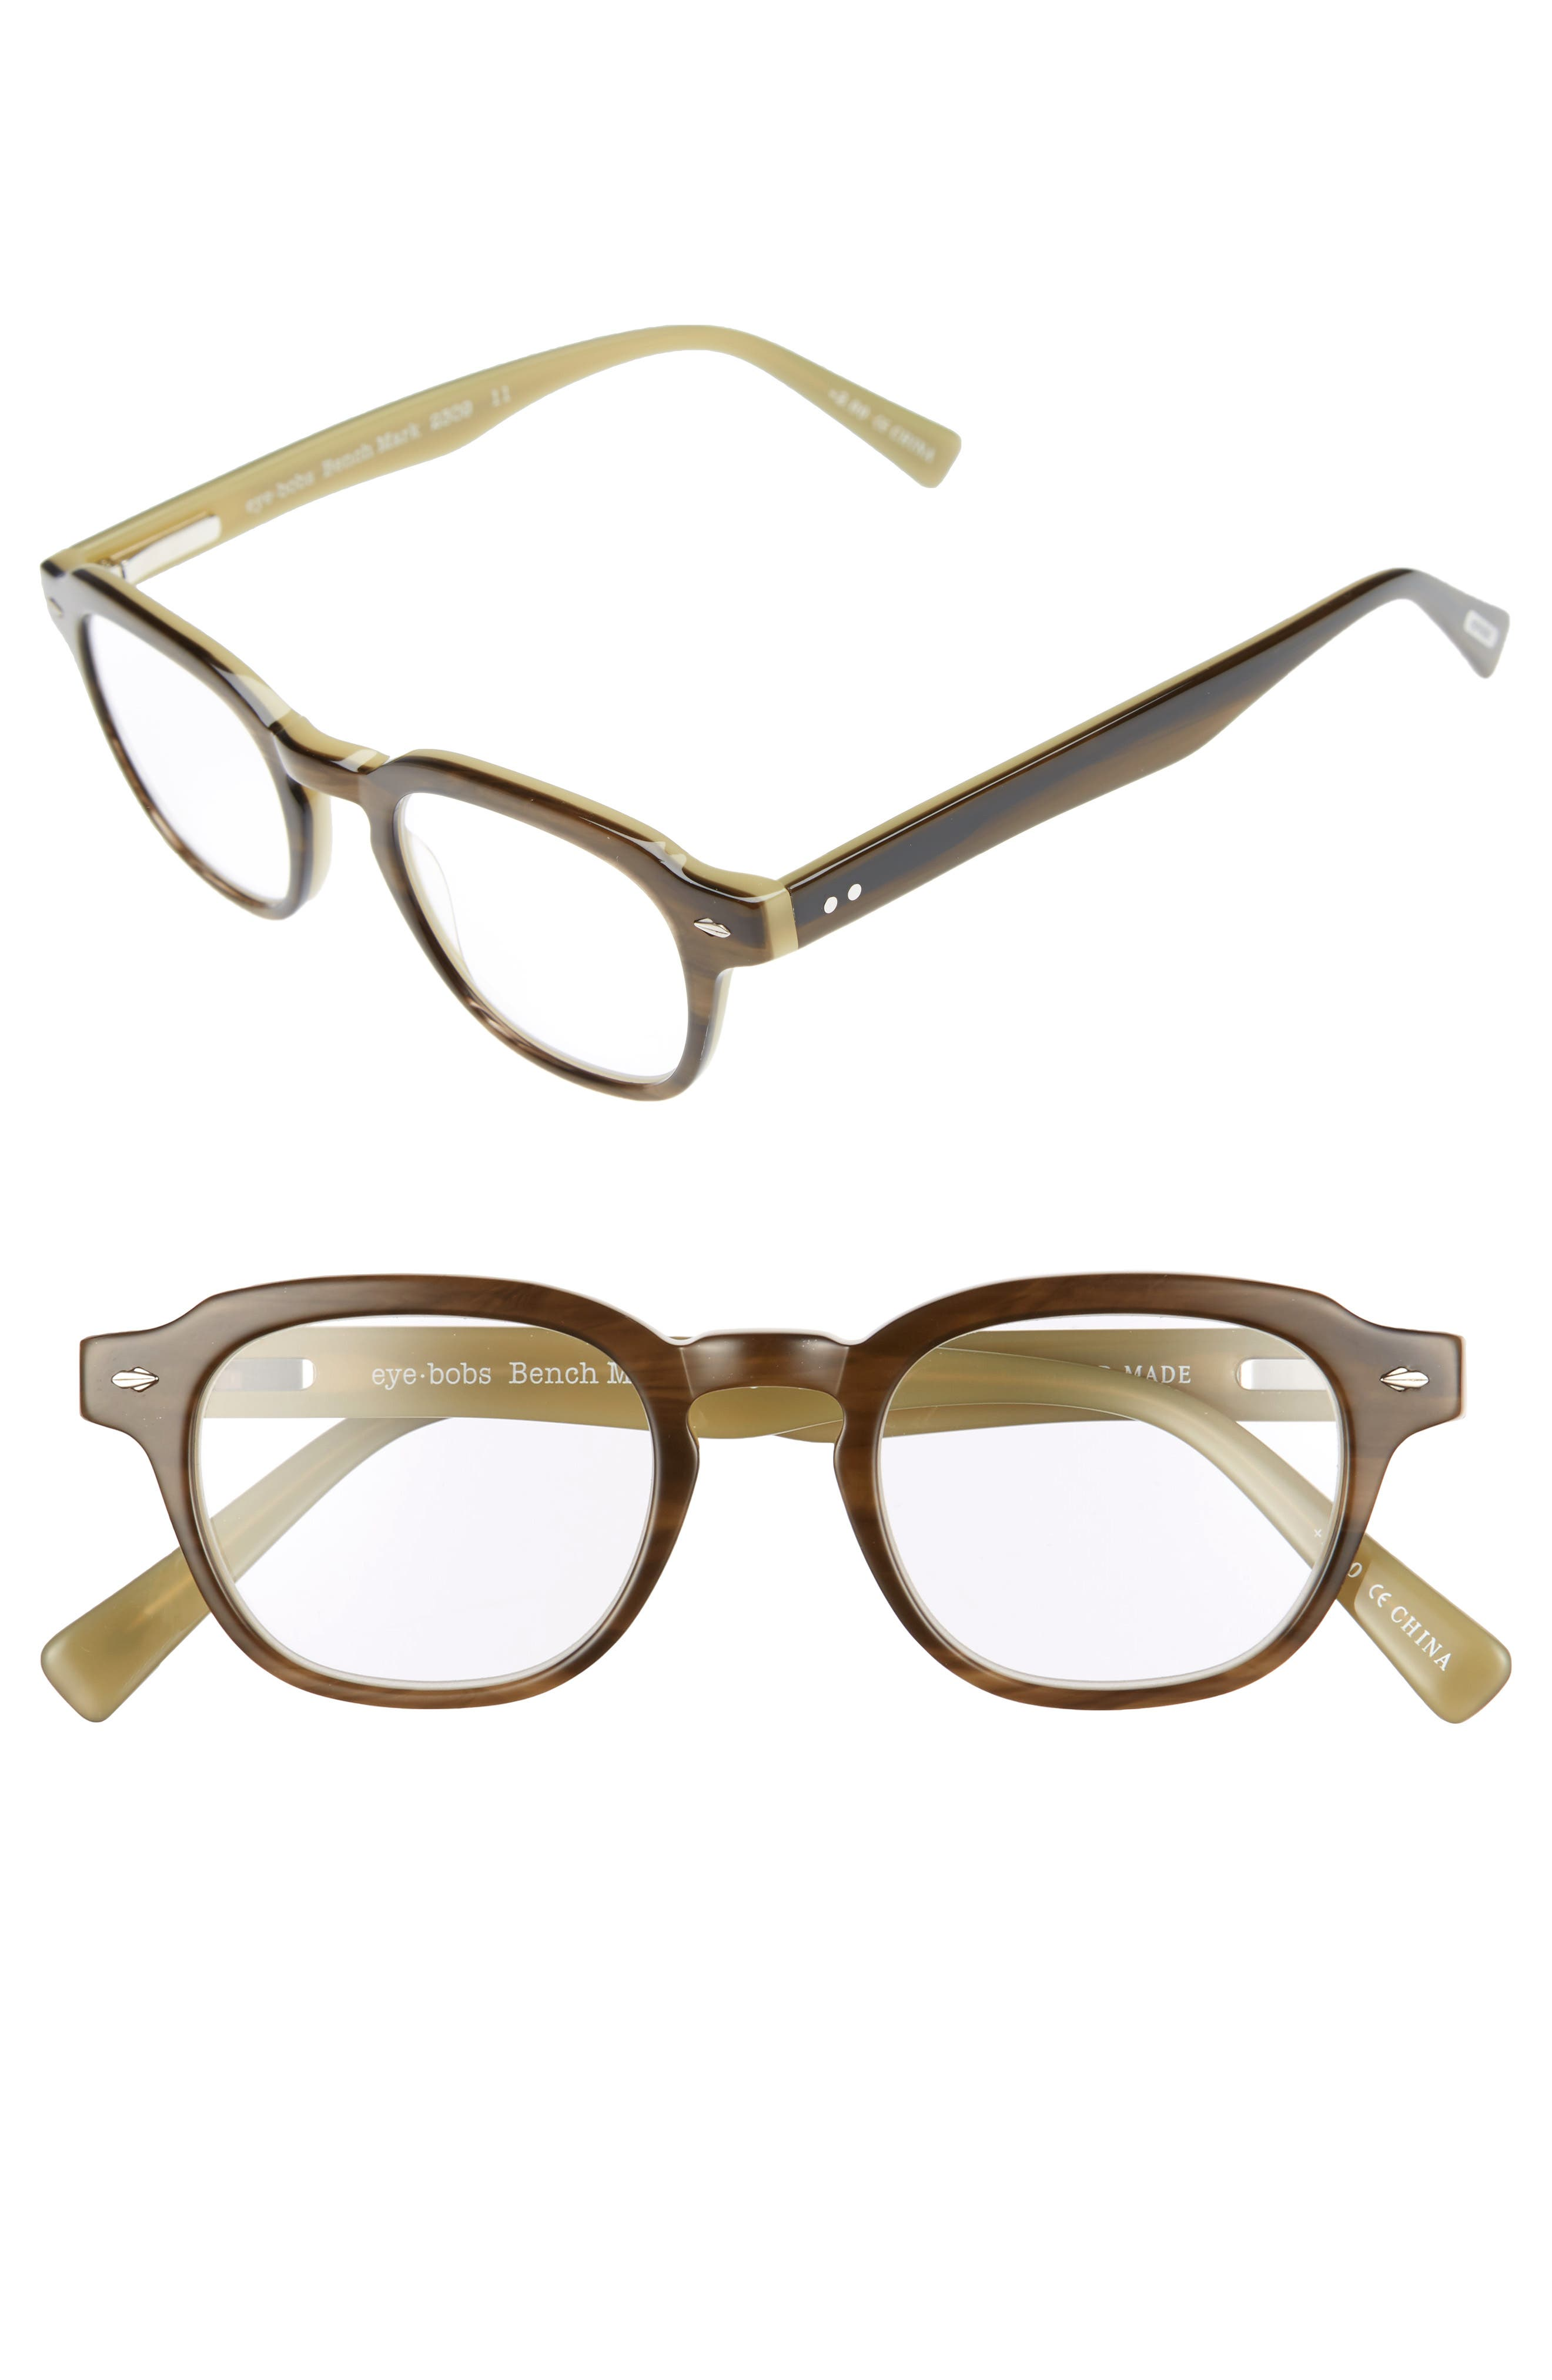 Bench Mark 46mm Reading Glasses,                             Main thumbnail 1, color,                             KHAKI GREEN